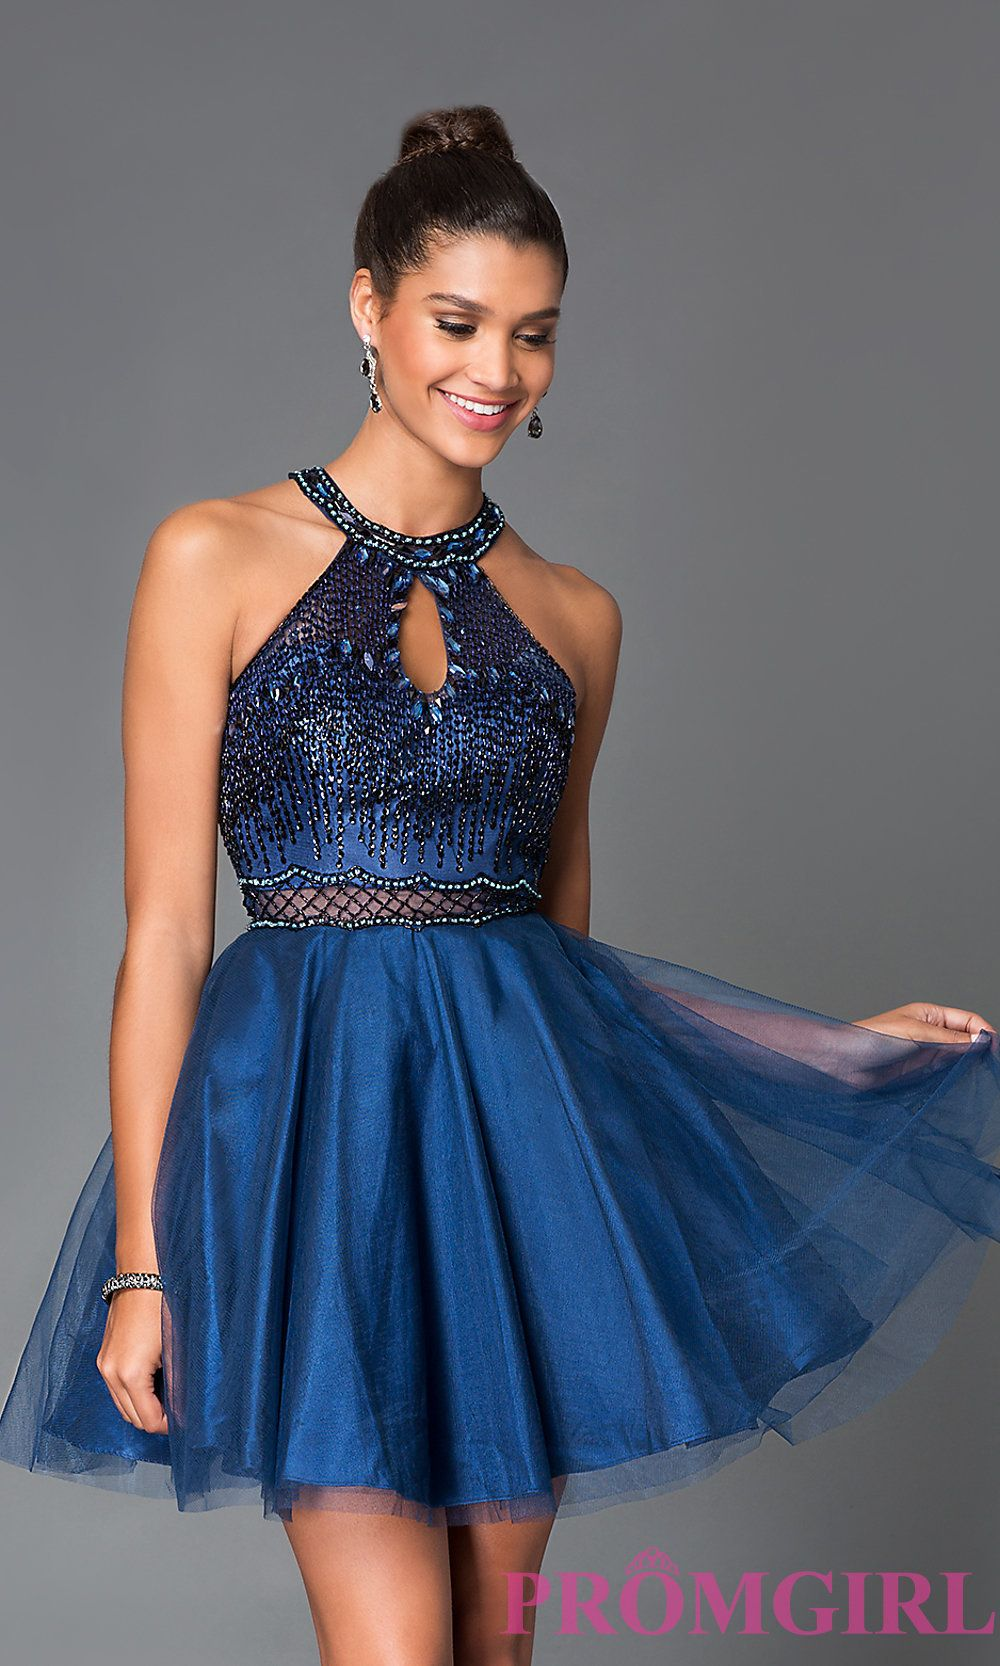 65bd74bdc5 Best Websites To Get Hoco Dresses